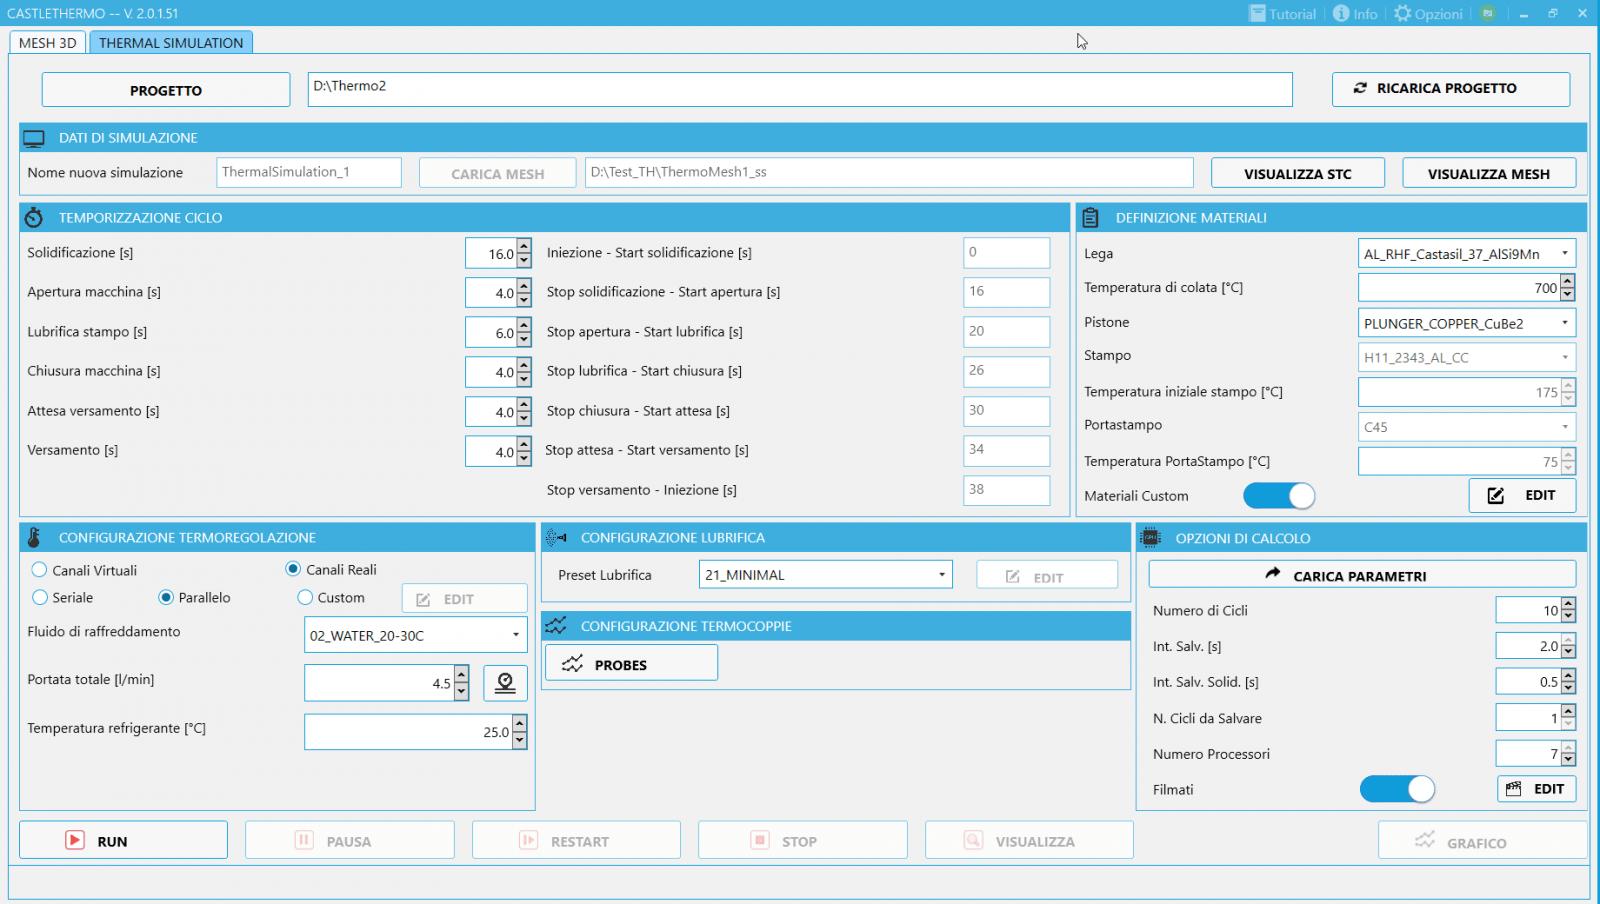 CastleTHERMO: Interfaccia user-friendly